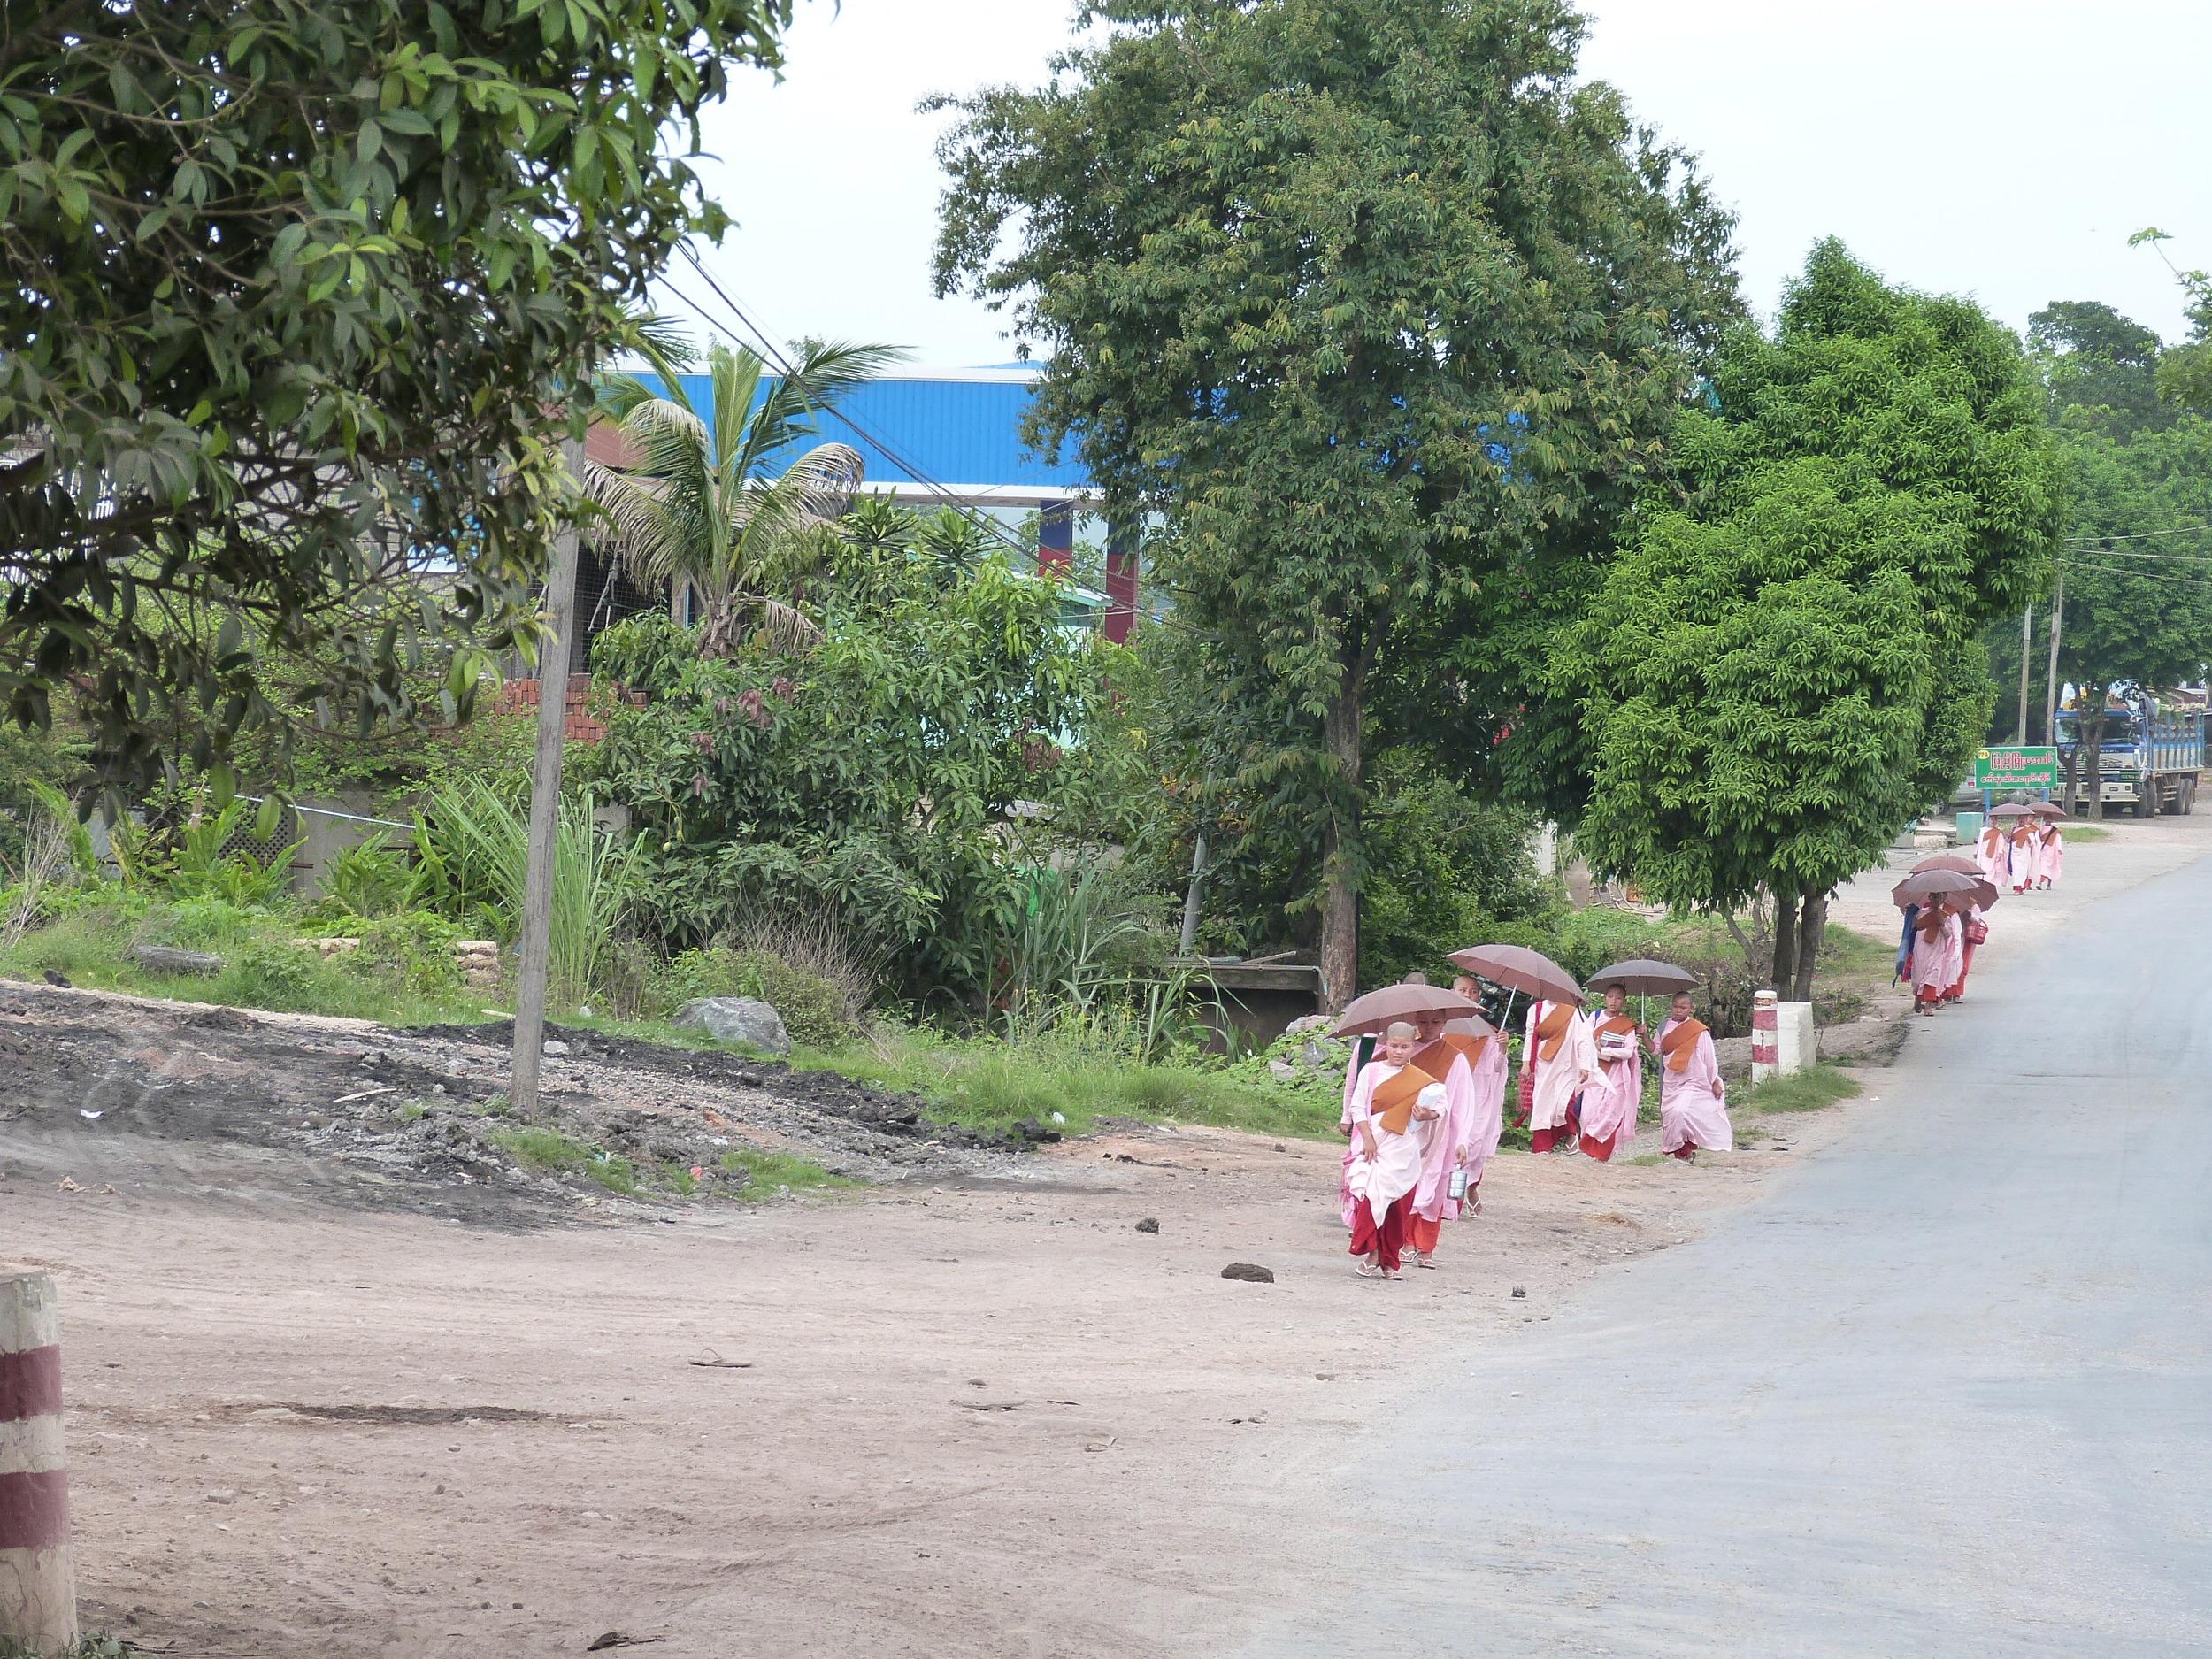 Young nuns on a stroll*Photo courtesy of Sarah Frenz